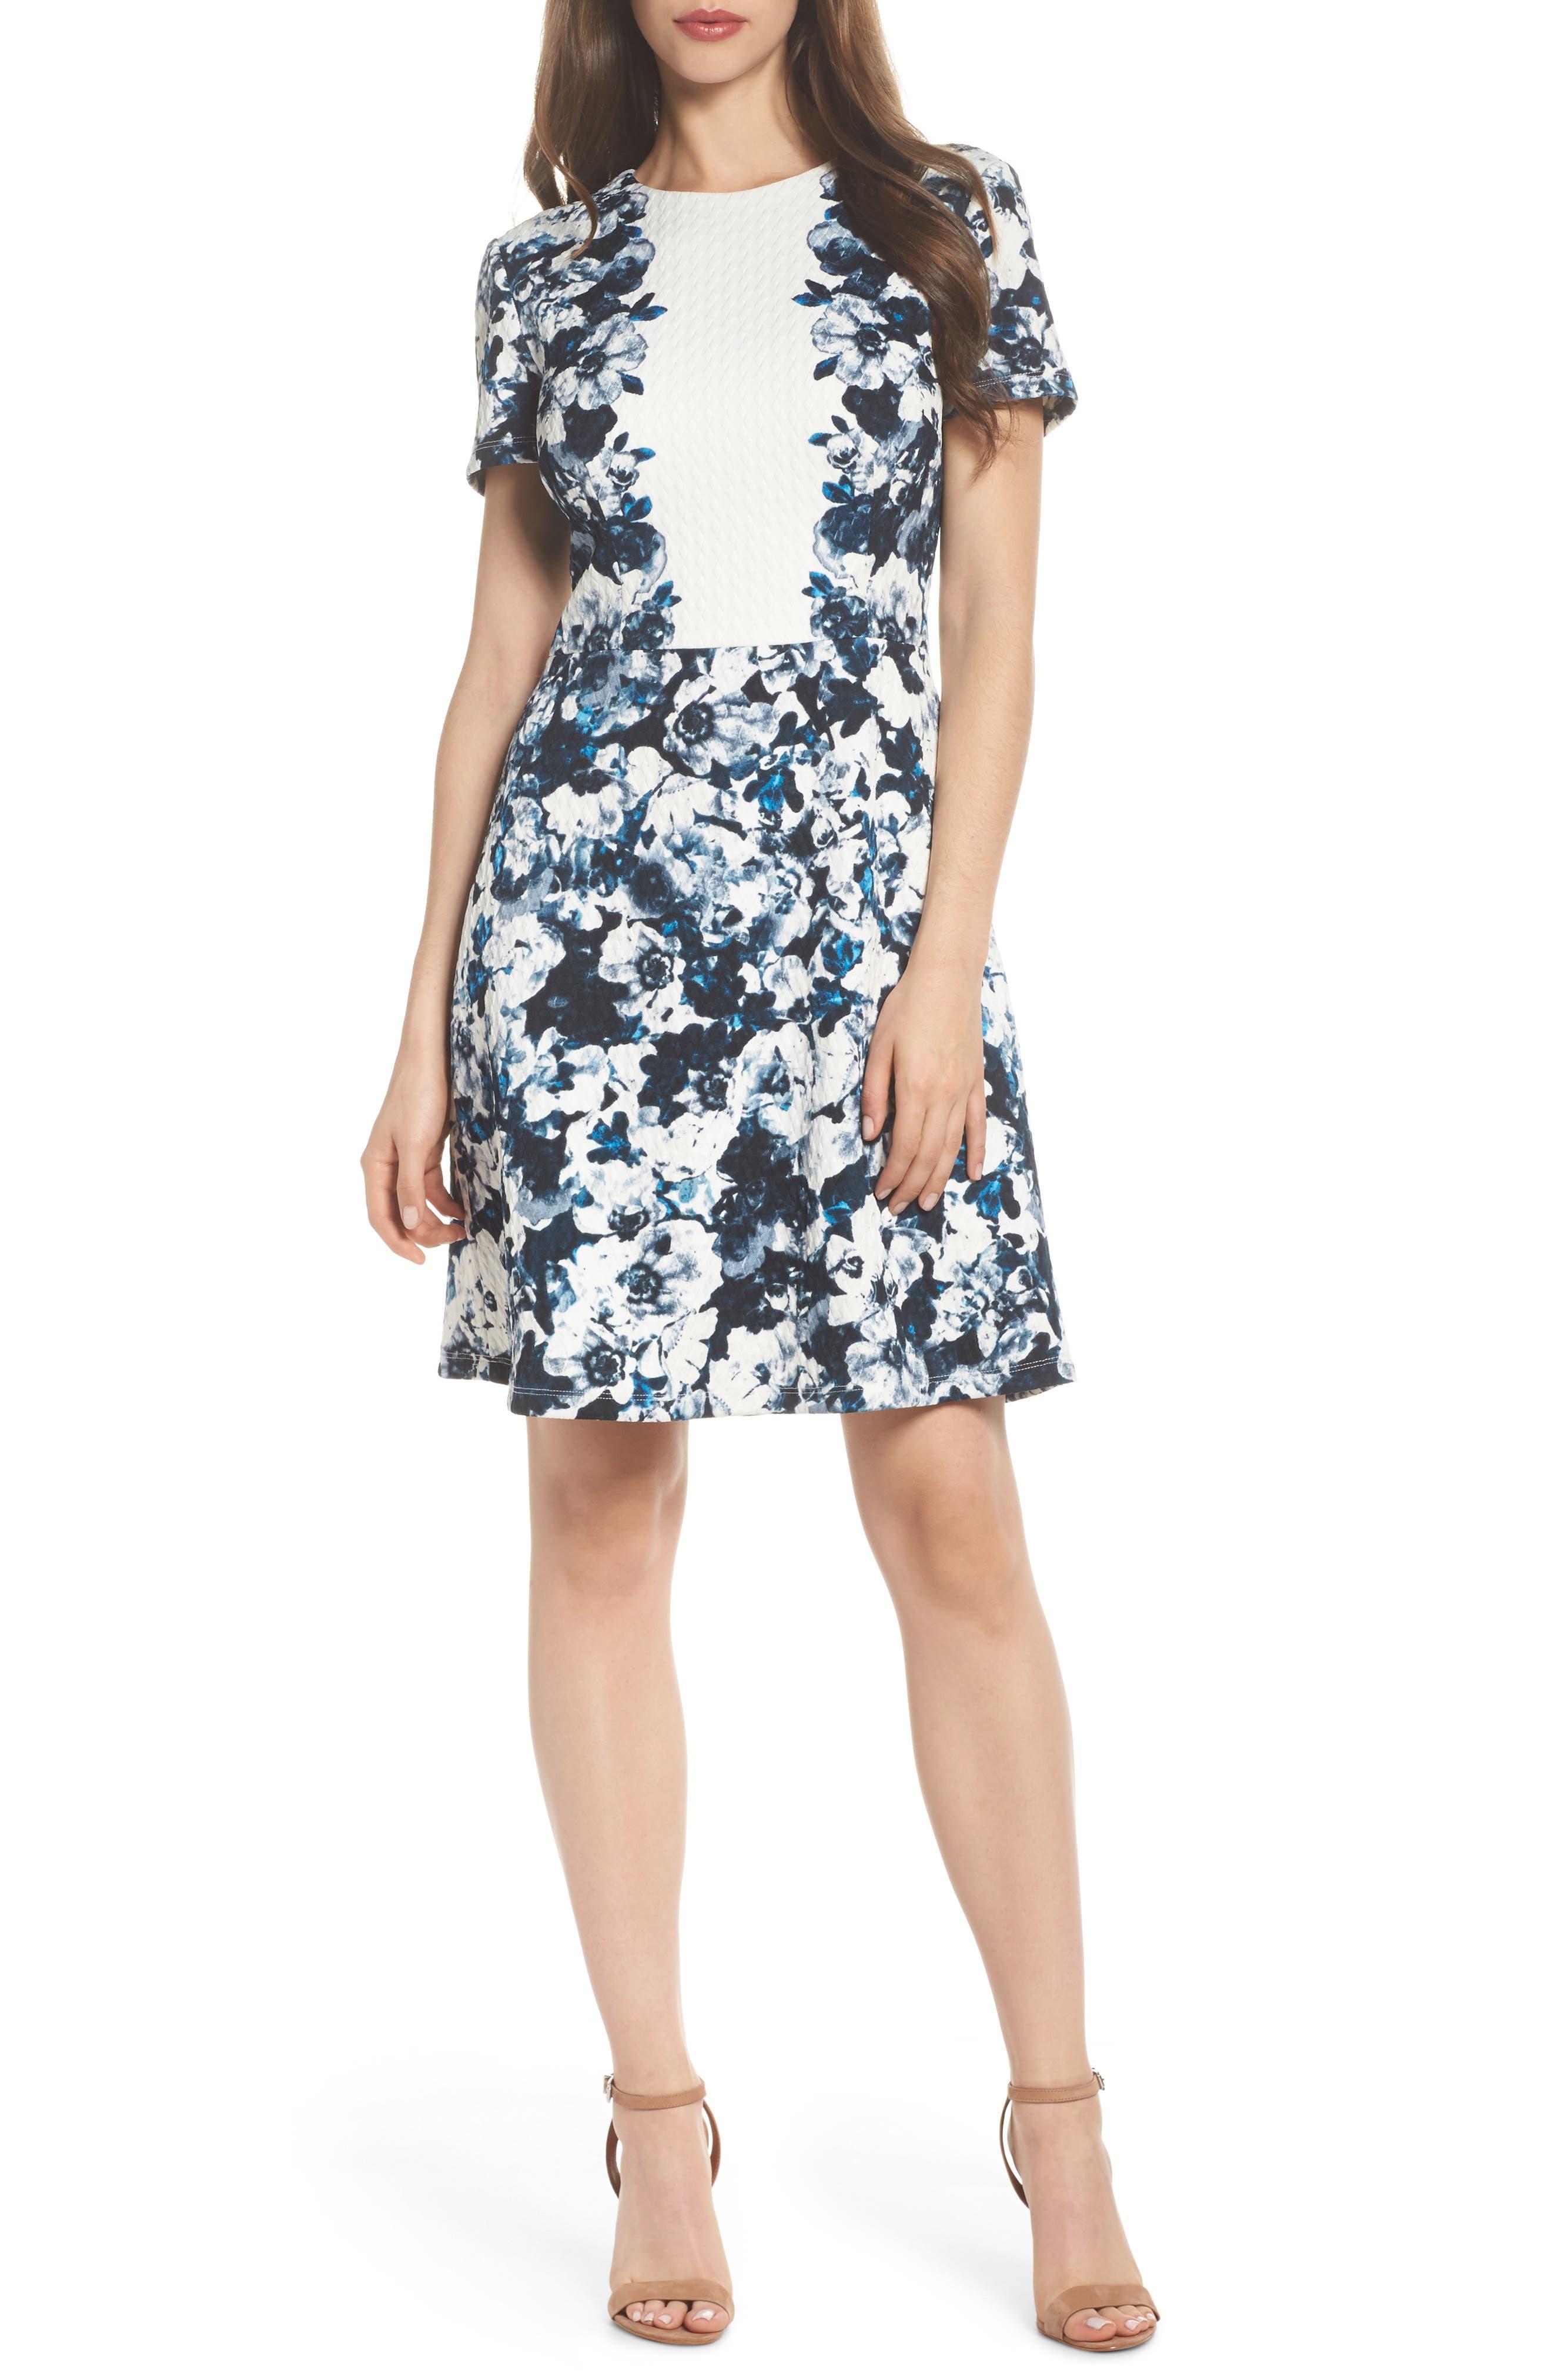 Harlequin Texture Print Fit & Flare Dress,                             Main thumbnail 1, color,                             Soft White/ Blue